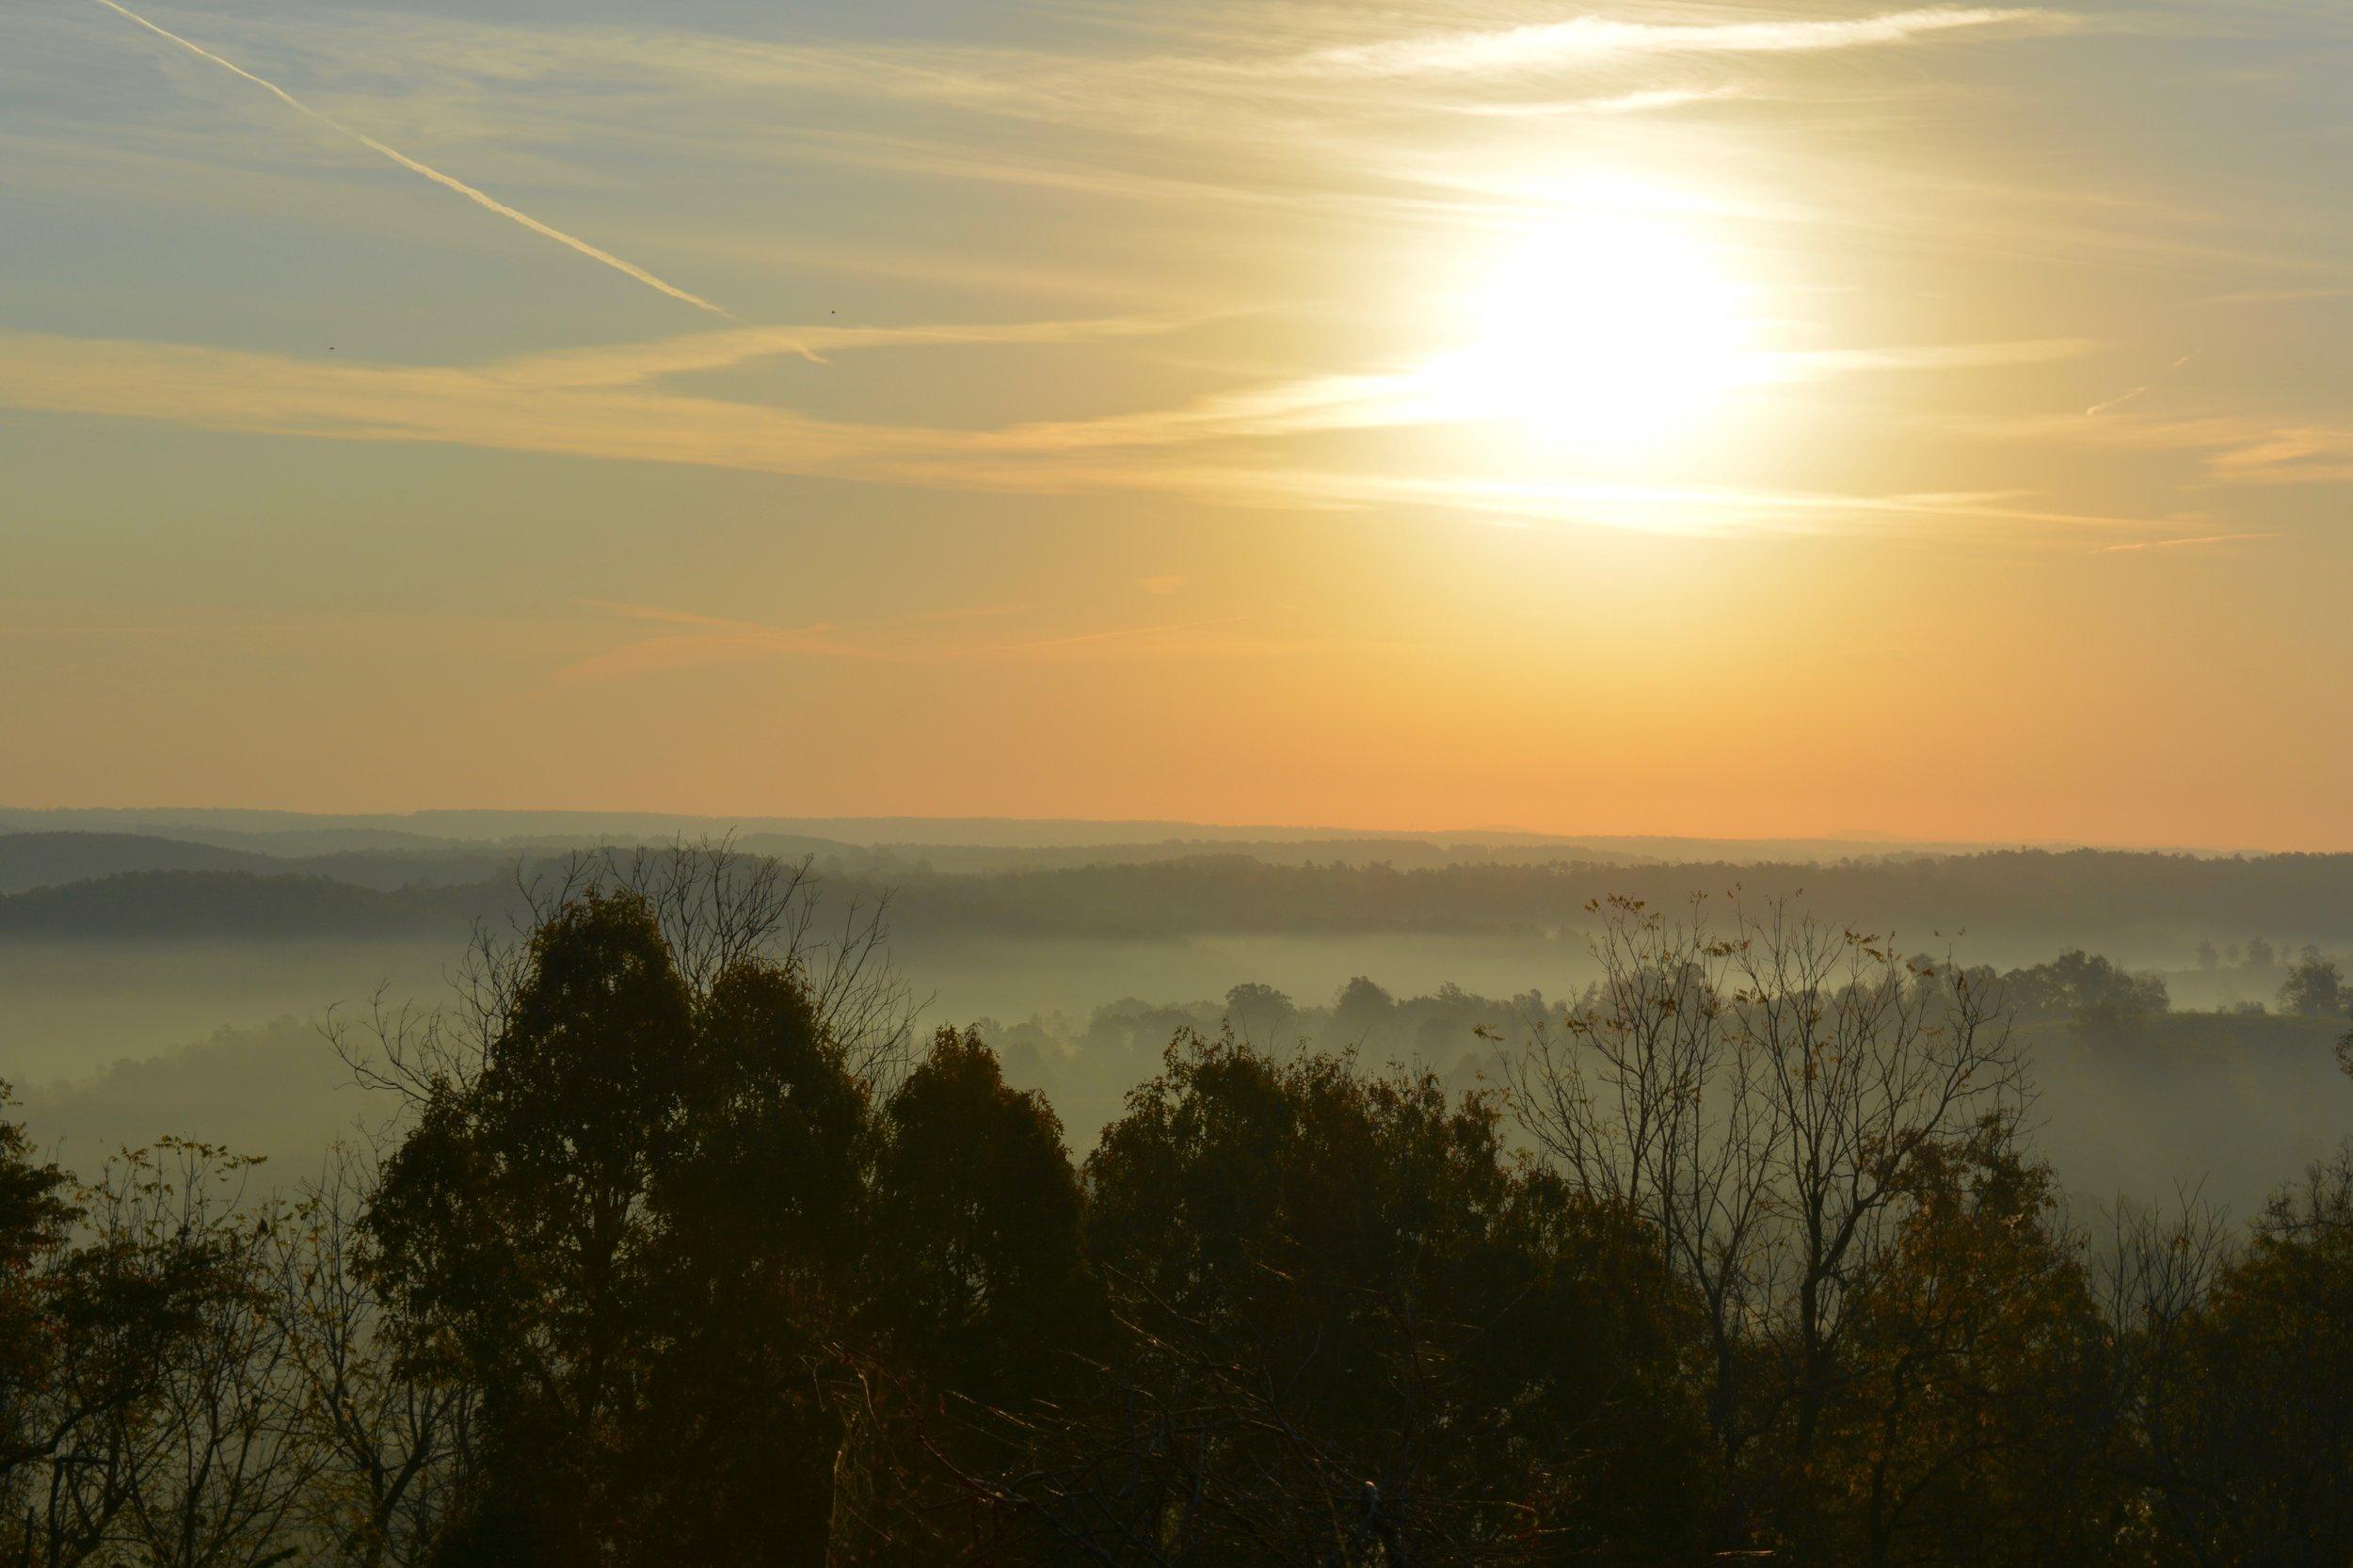 My morning view leaving Eureka Springs, near Morgan, Arkansas